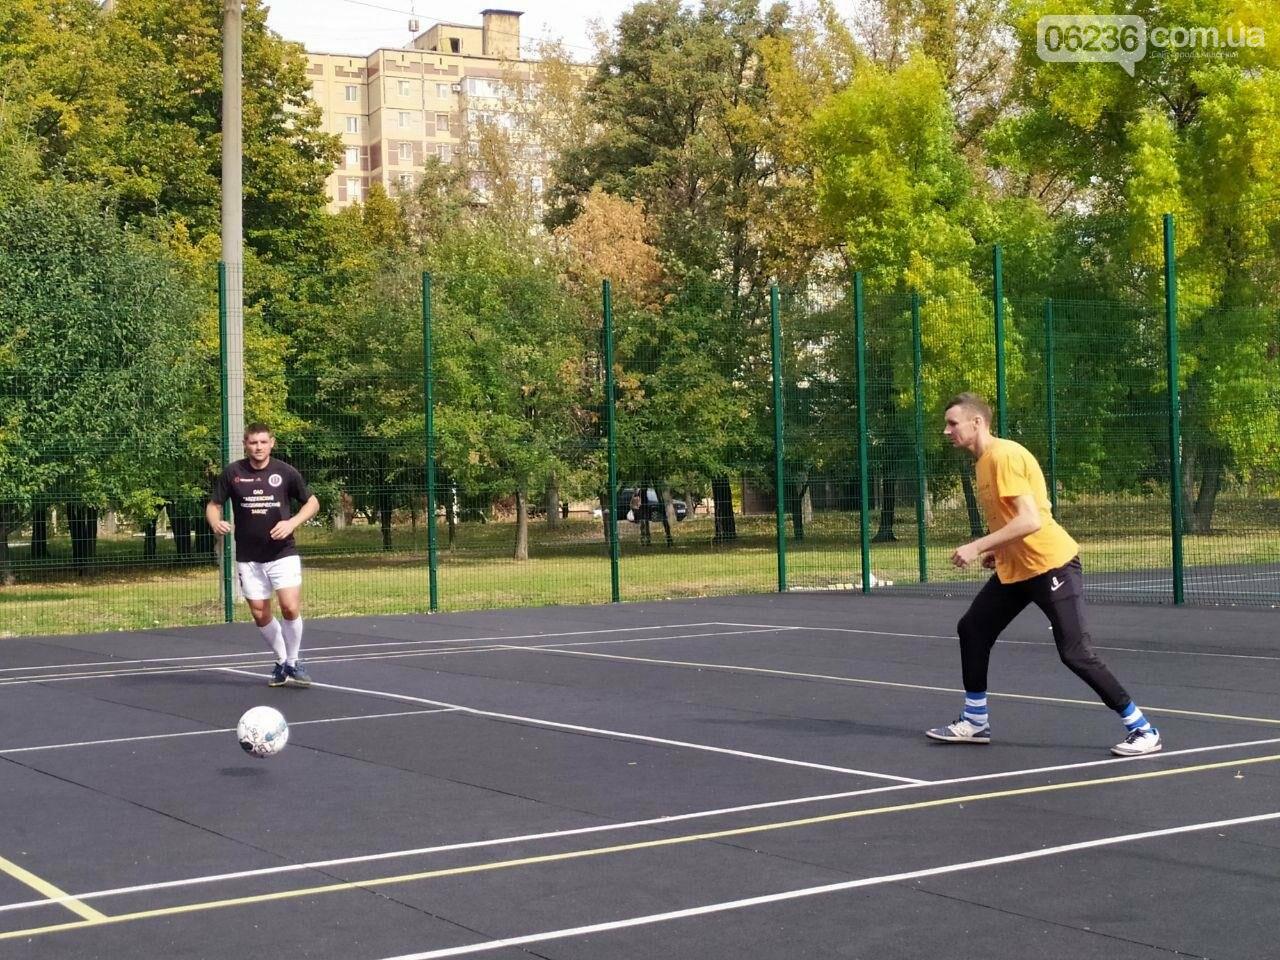 В Авдеевке возродили теннисболл (ФОТО), фото-3